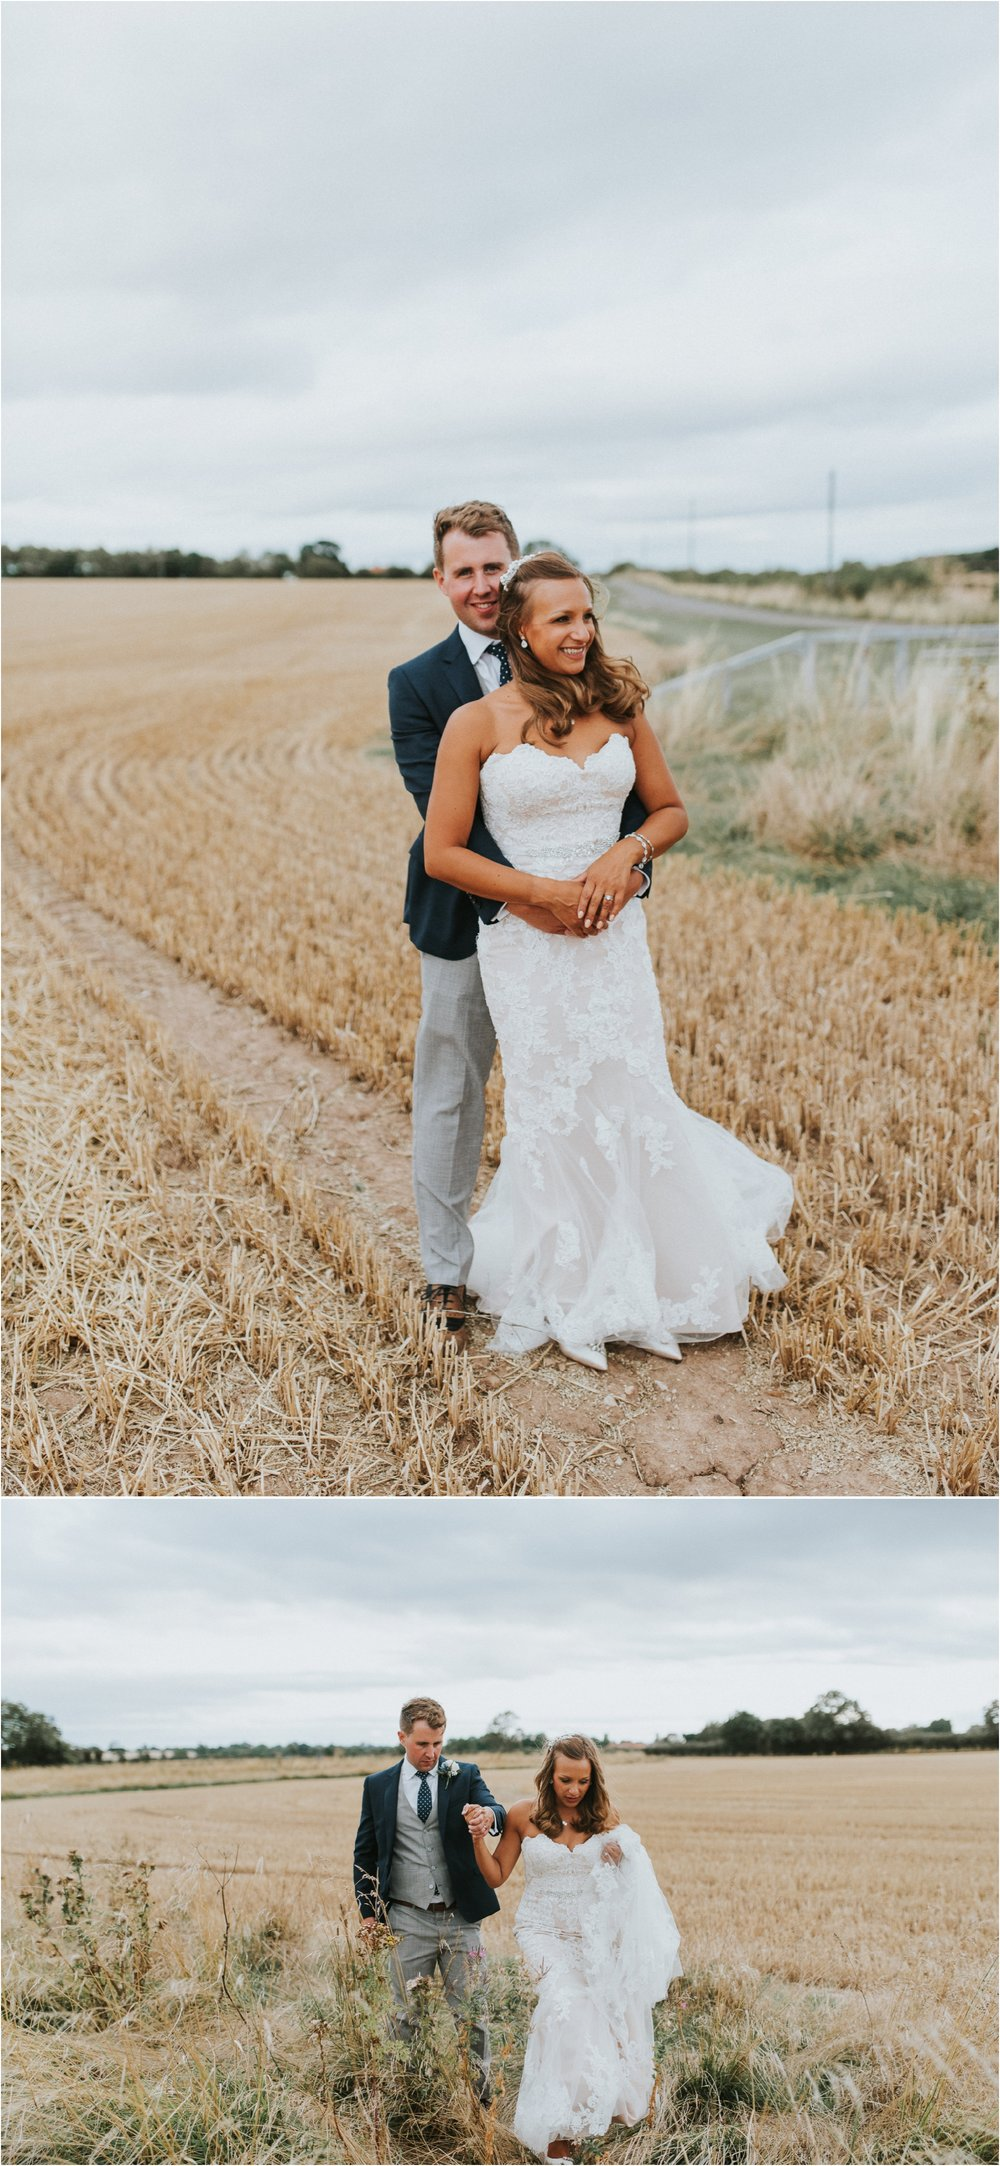 PheasantBrewery-LukeHolroyd-Yorkshirewedding_000195.jpg